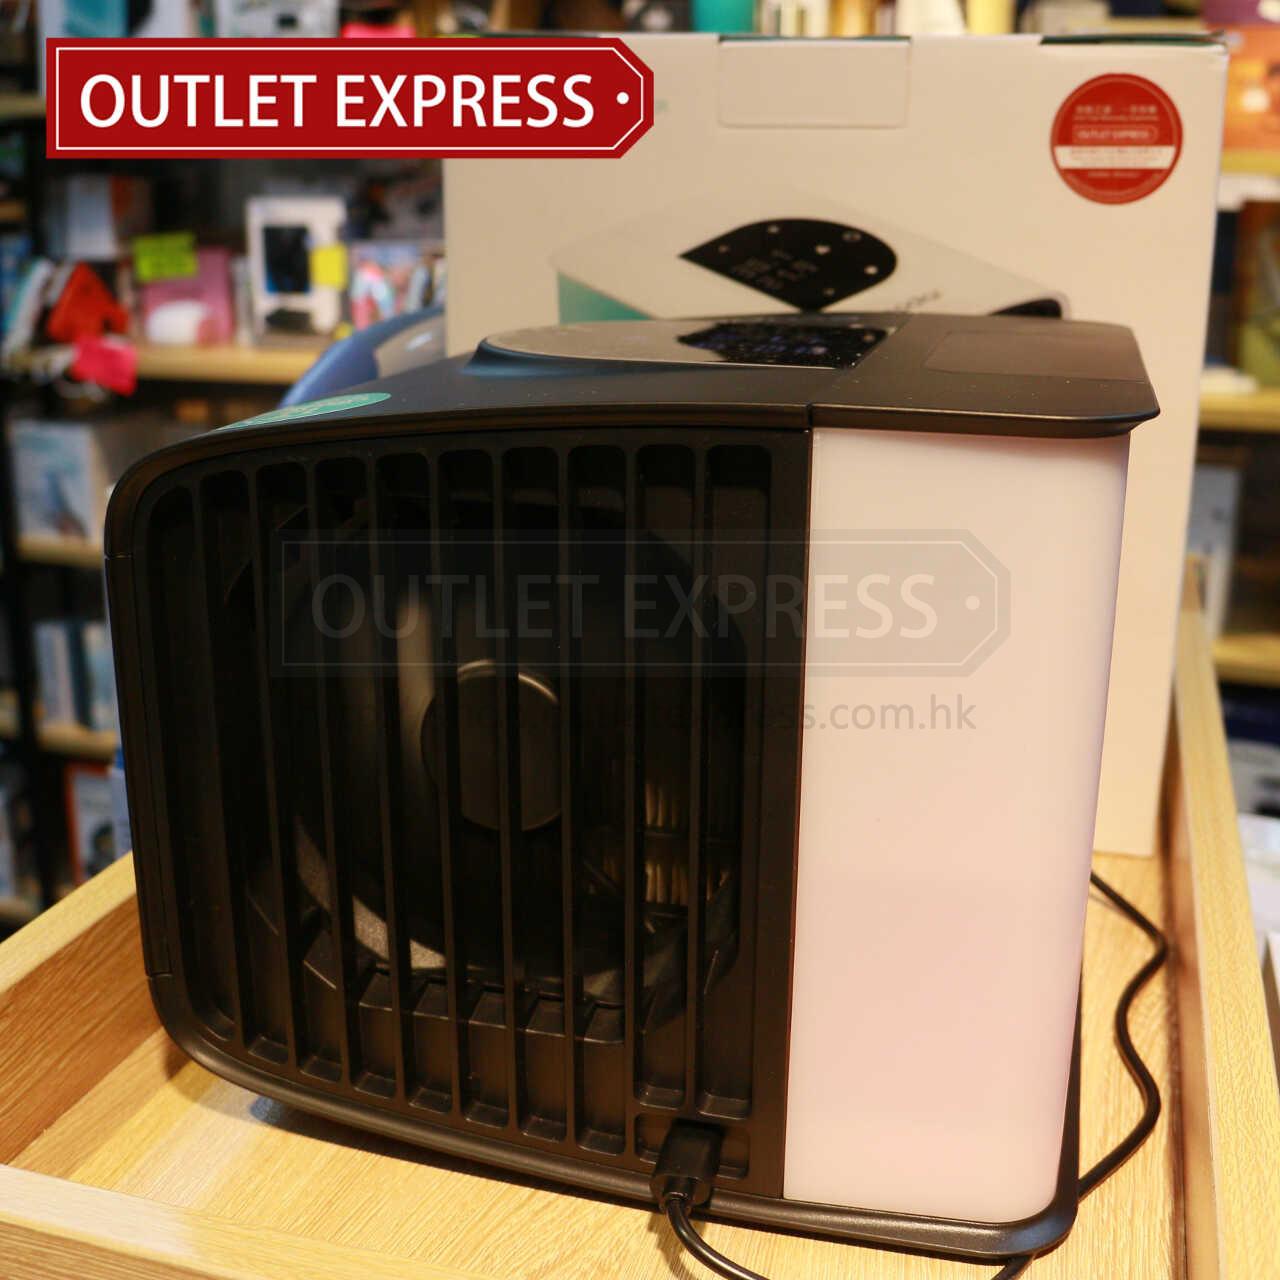 Evapolar 二代小型個人流動冷氣機 (evaSMART EV-3000) | 智能水冷風機 ( 現貨發售 ) | 香港行貨 Type C- Outlet Express HK生活百貨城實拍相片